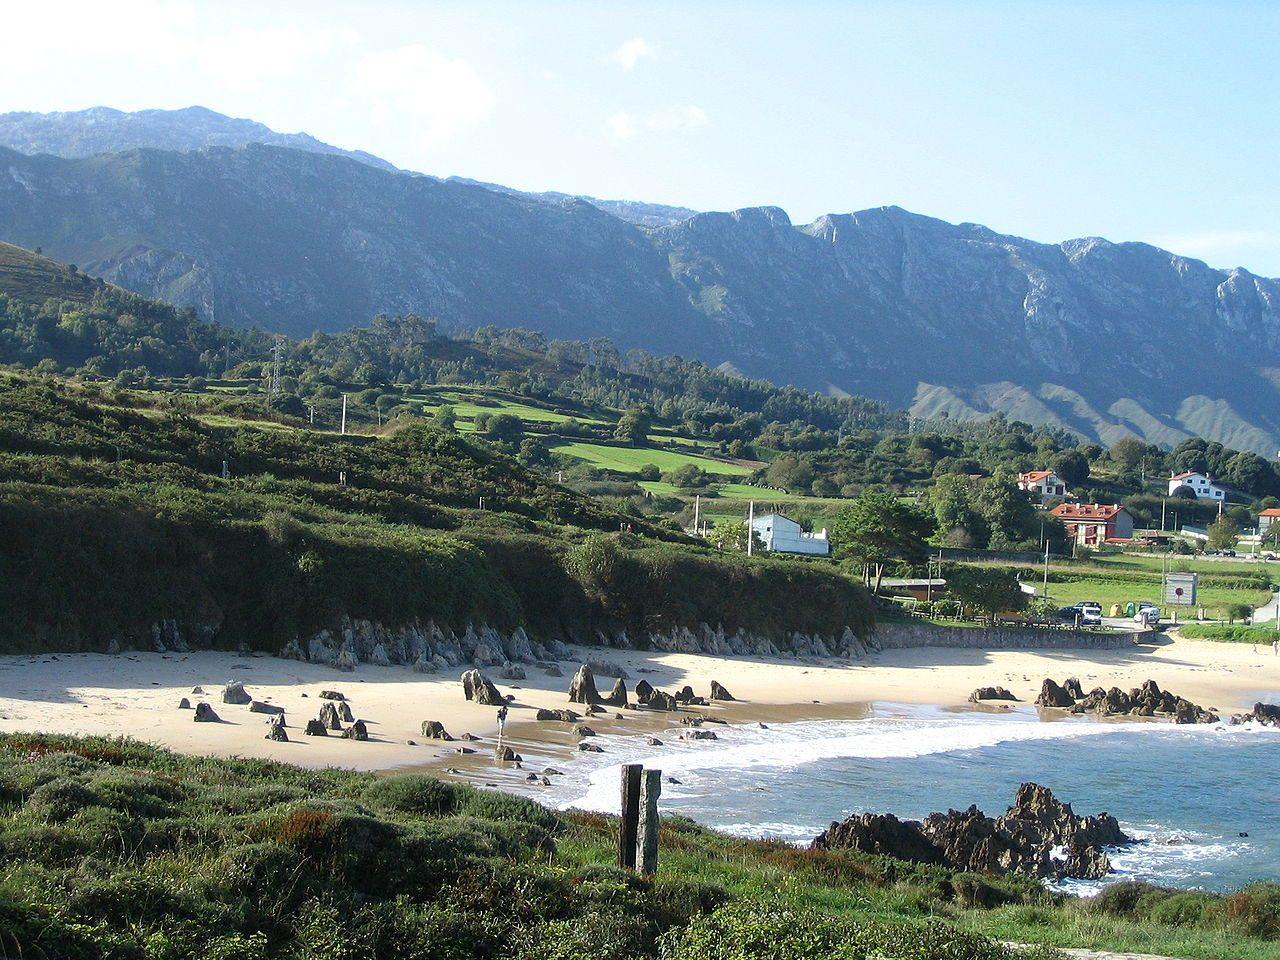 Playa de Torò. Foto di Marcus Braun